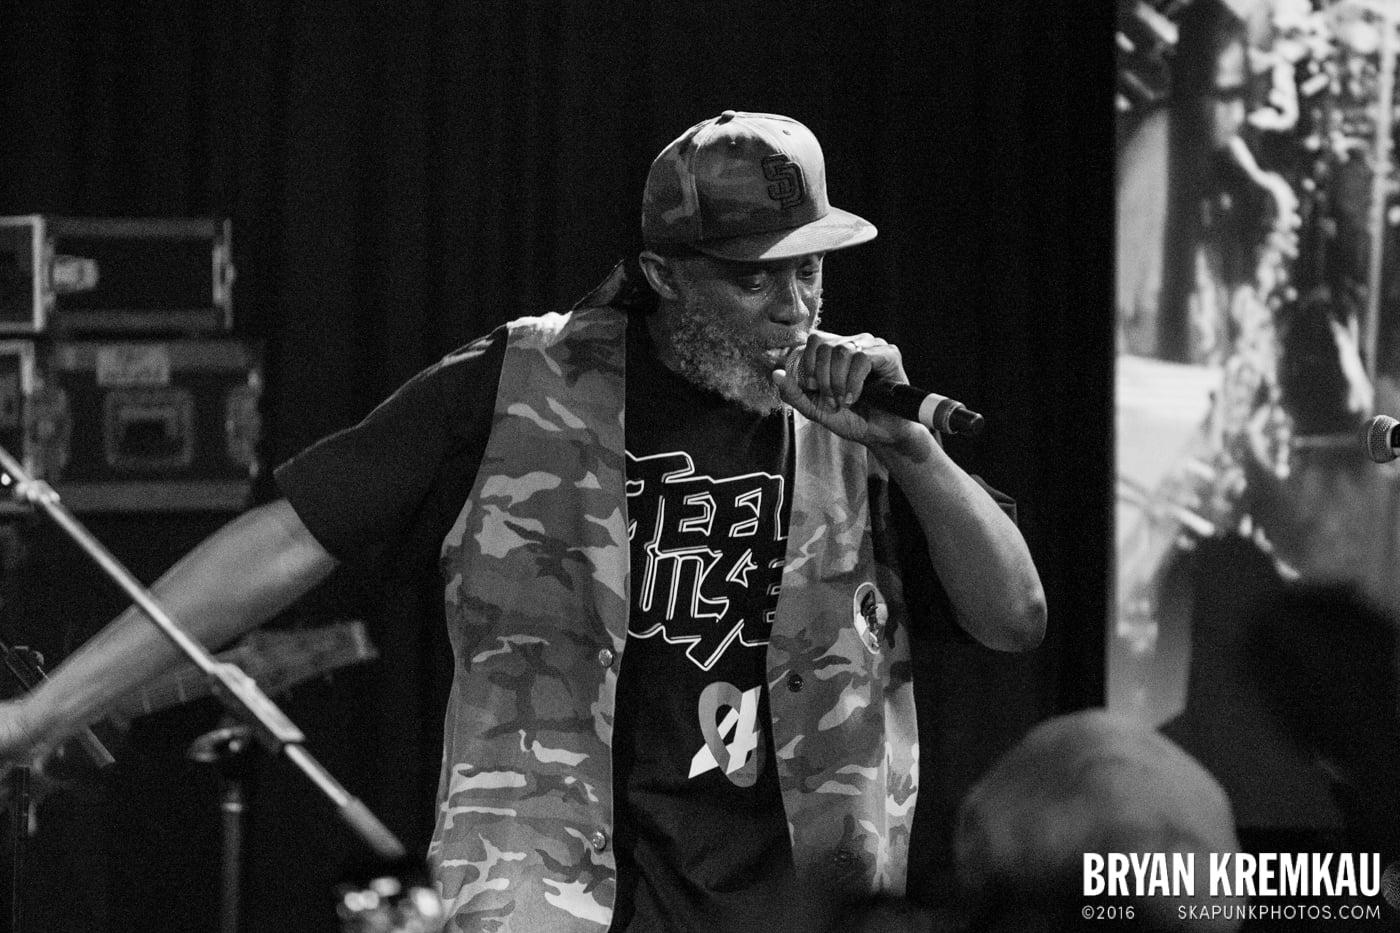 Steel Pulse @ B.B King Blues Club, NYC (5)